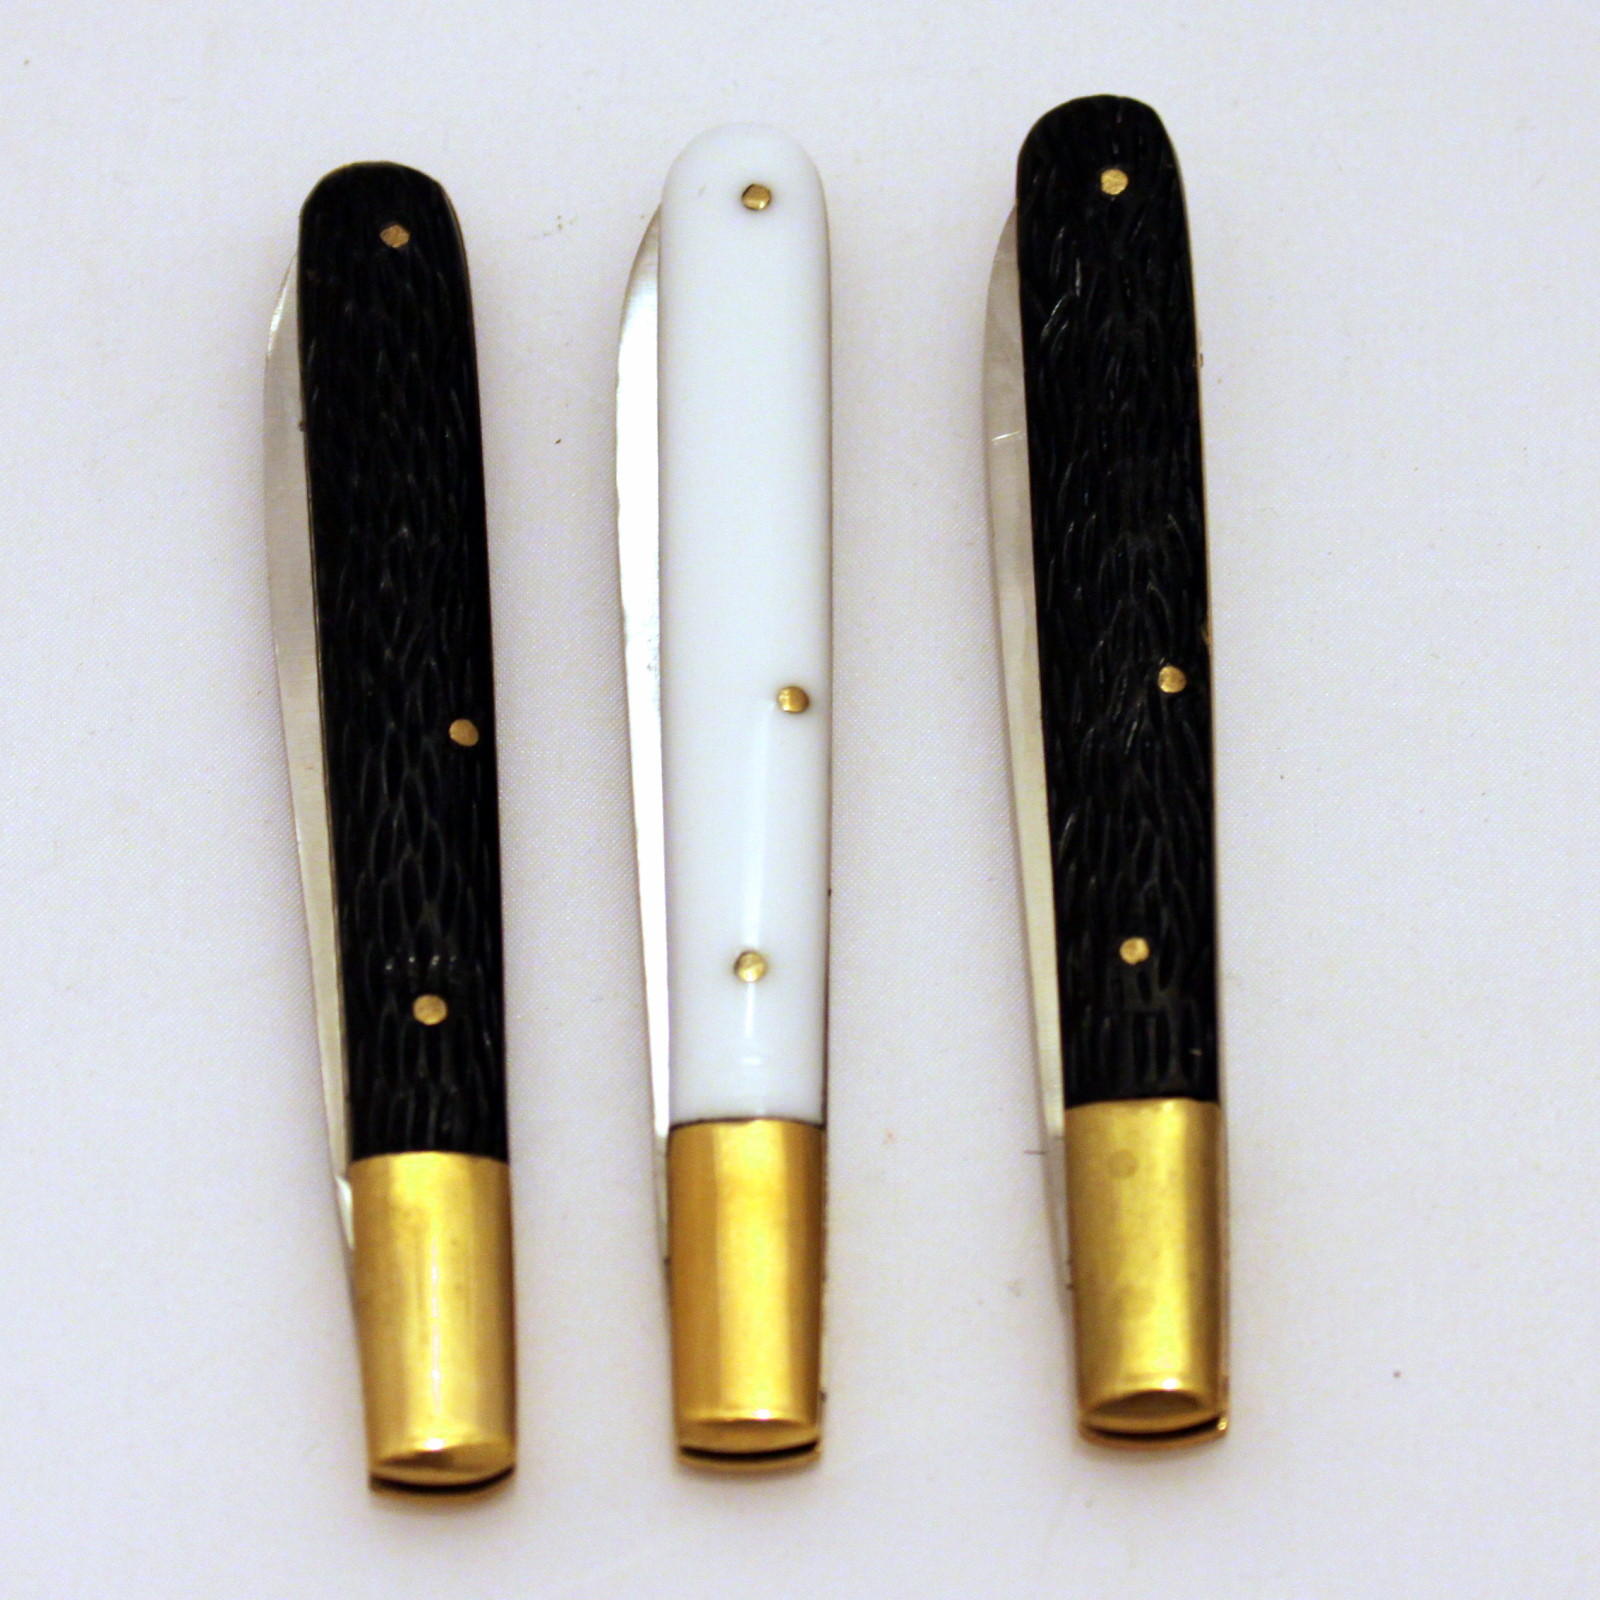 Giant Stag/White Knives by Joe Mogar